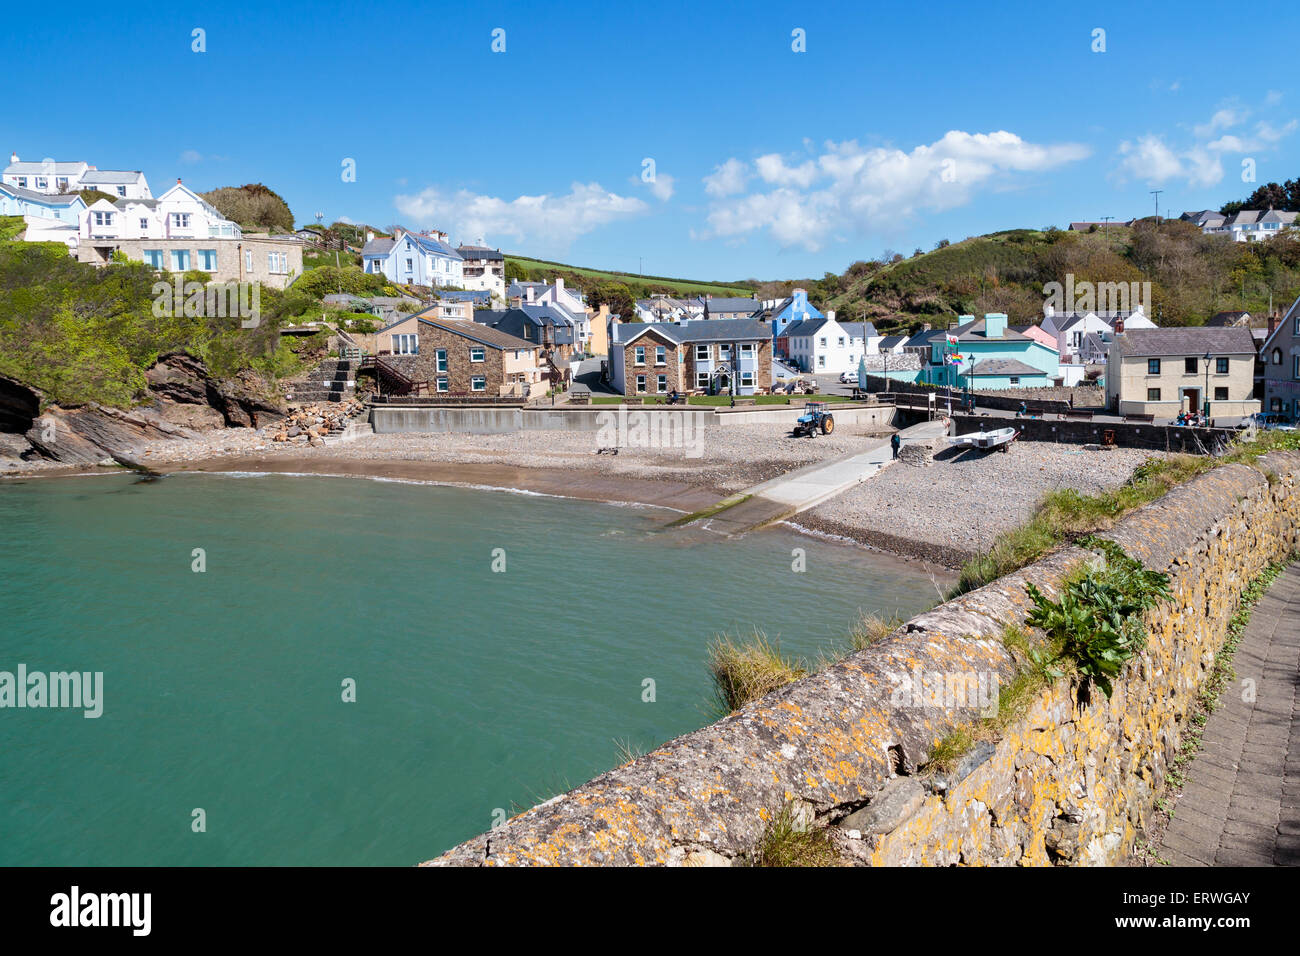 Little Haven a  quaint  fishing village in the Pembrokeshire Coast National Park Wales UK - Stock Image